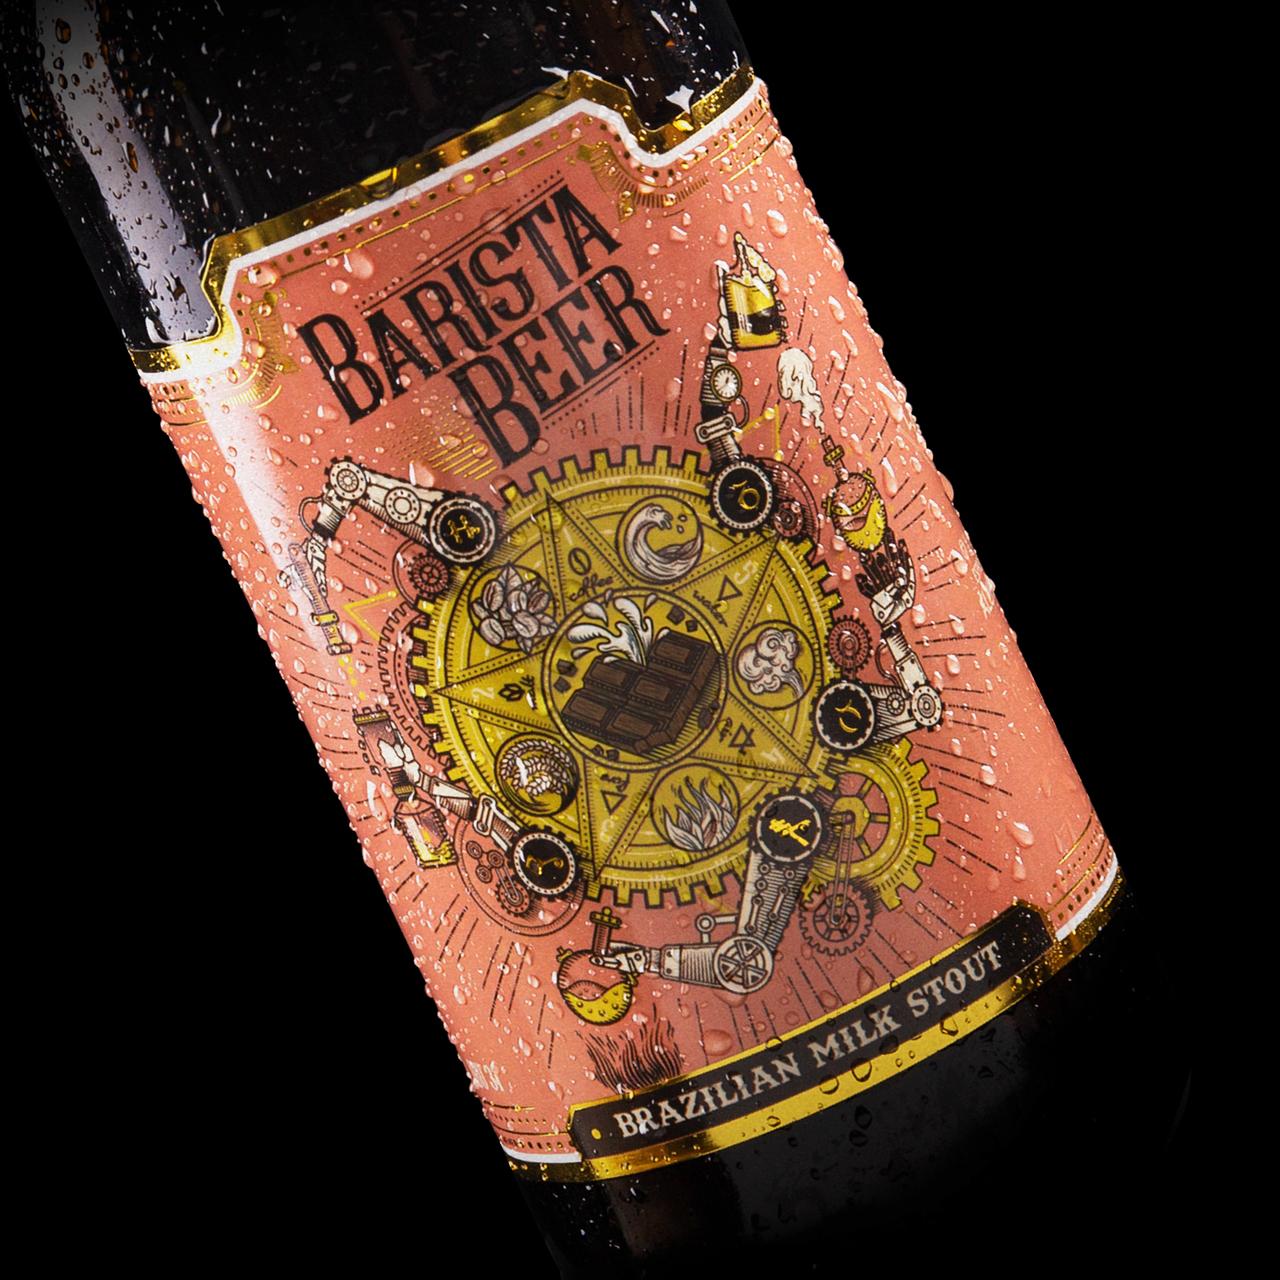 02.PI-6_Espresso_Alchemy_X_Lab_Brewer_Barieta_Beer.jpg